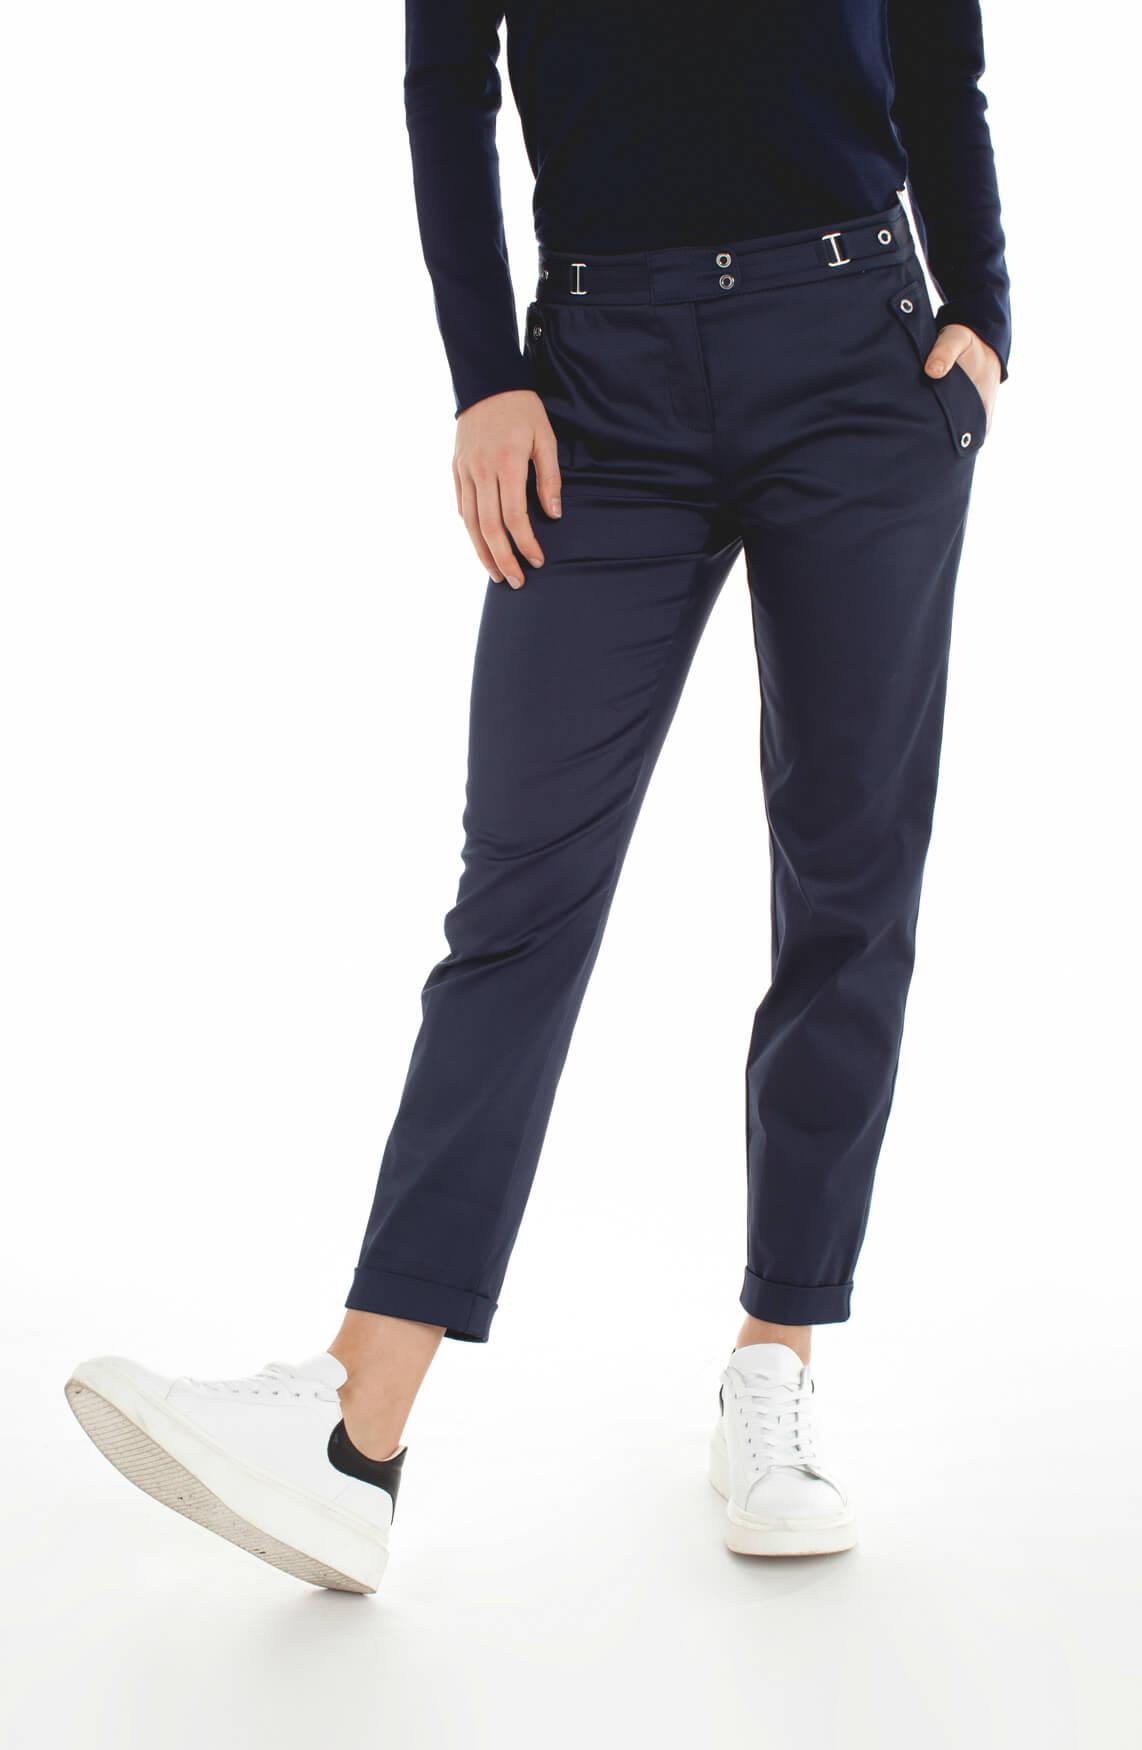 Rosner Dames Alisa pantalon met riempje Blauw